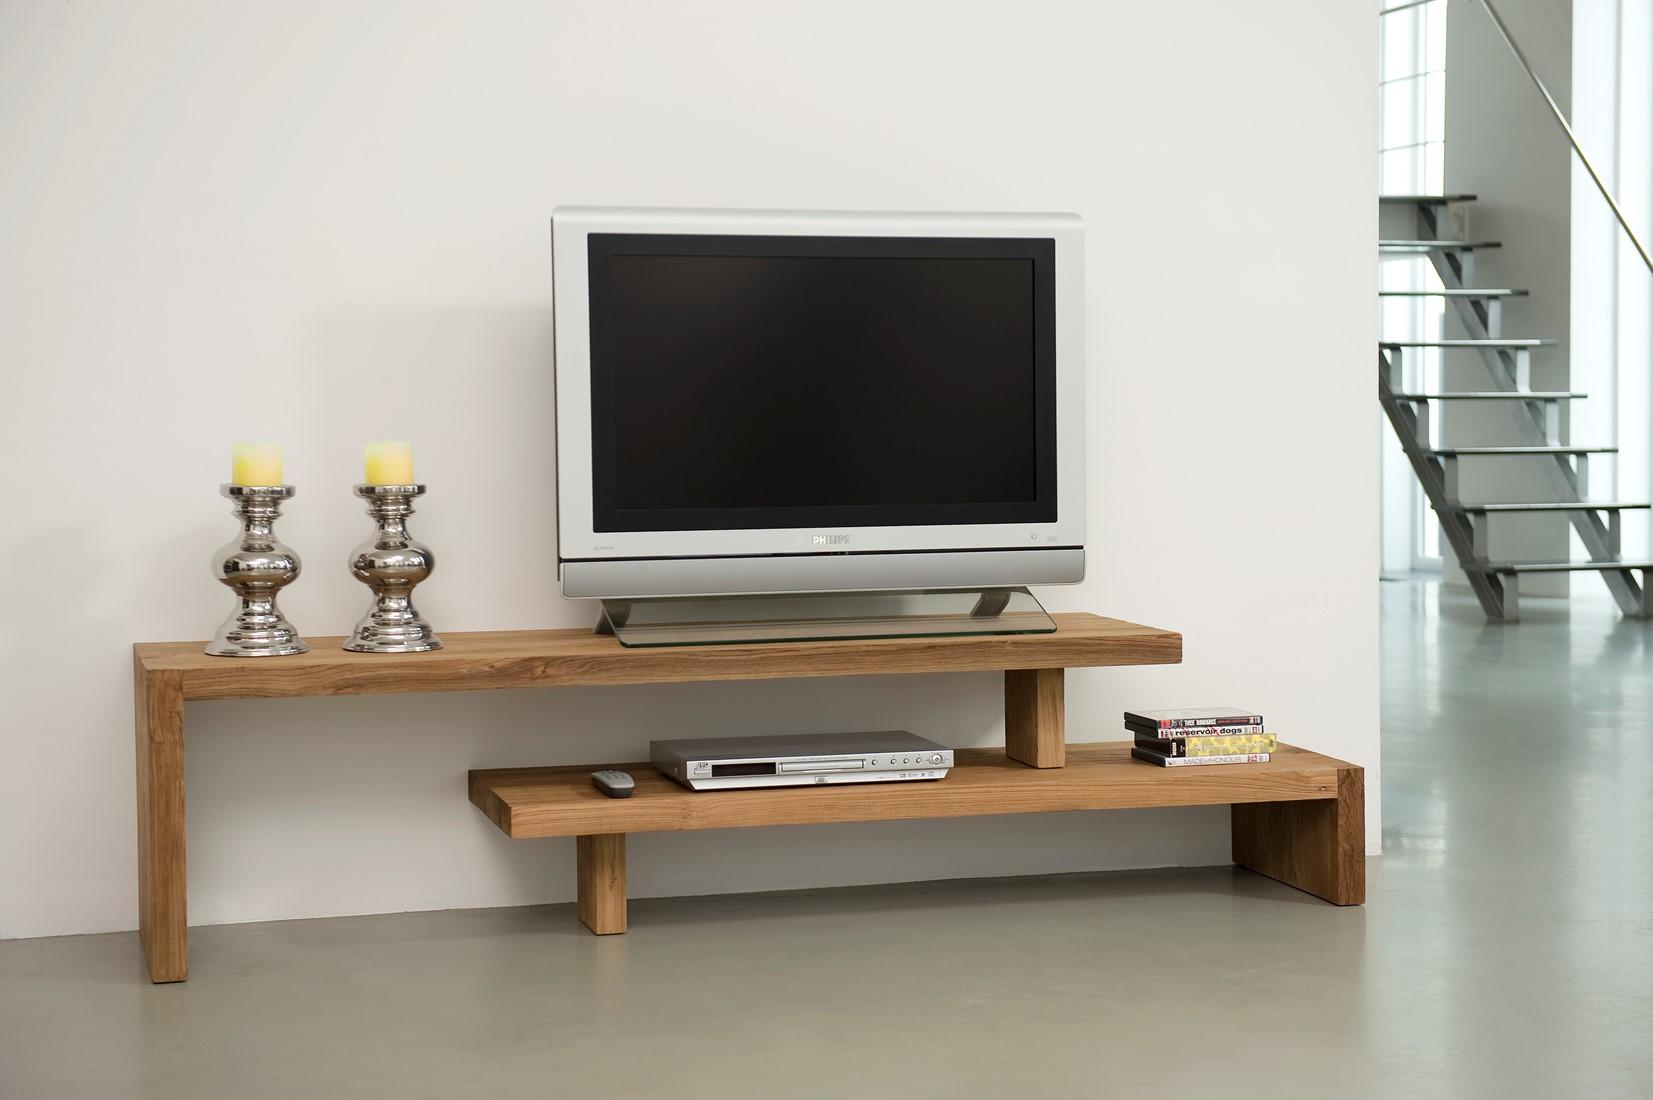 Tv Meubel Plank.D Bodhi Classic Tv Stand Lekk Extendable